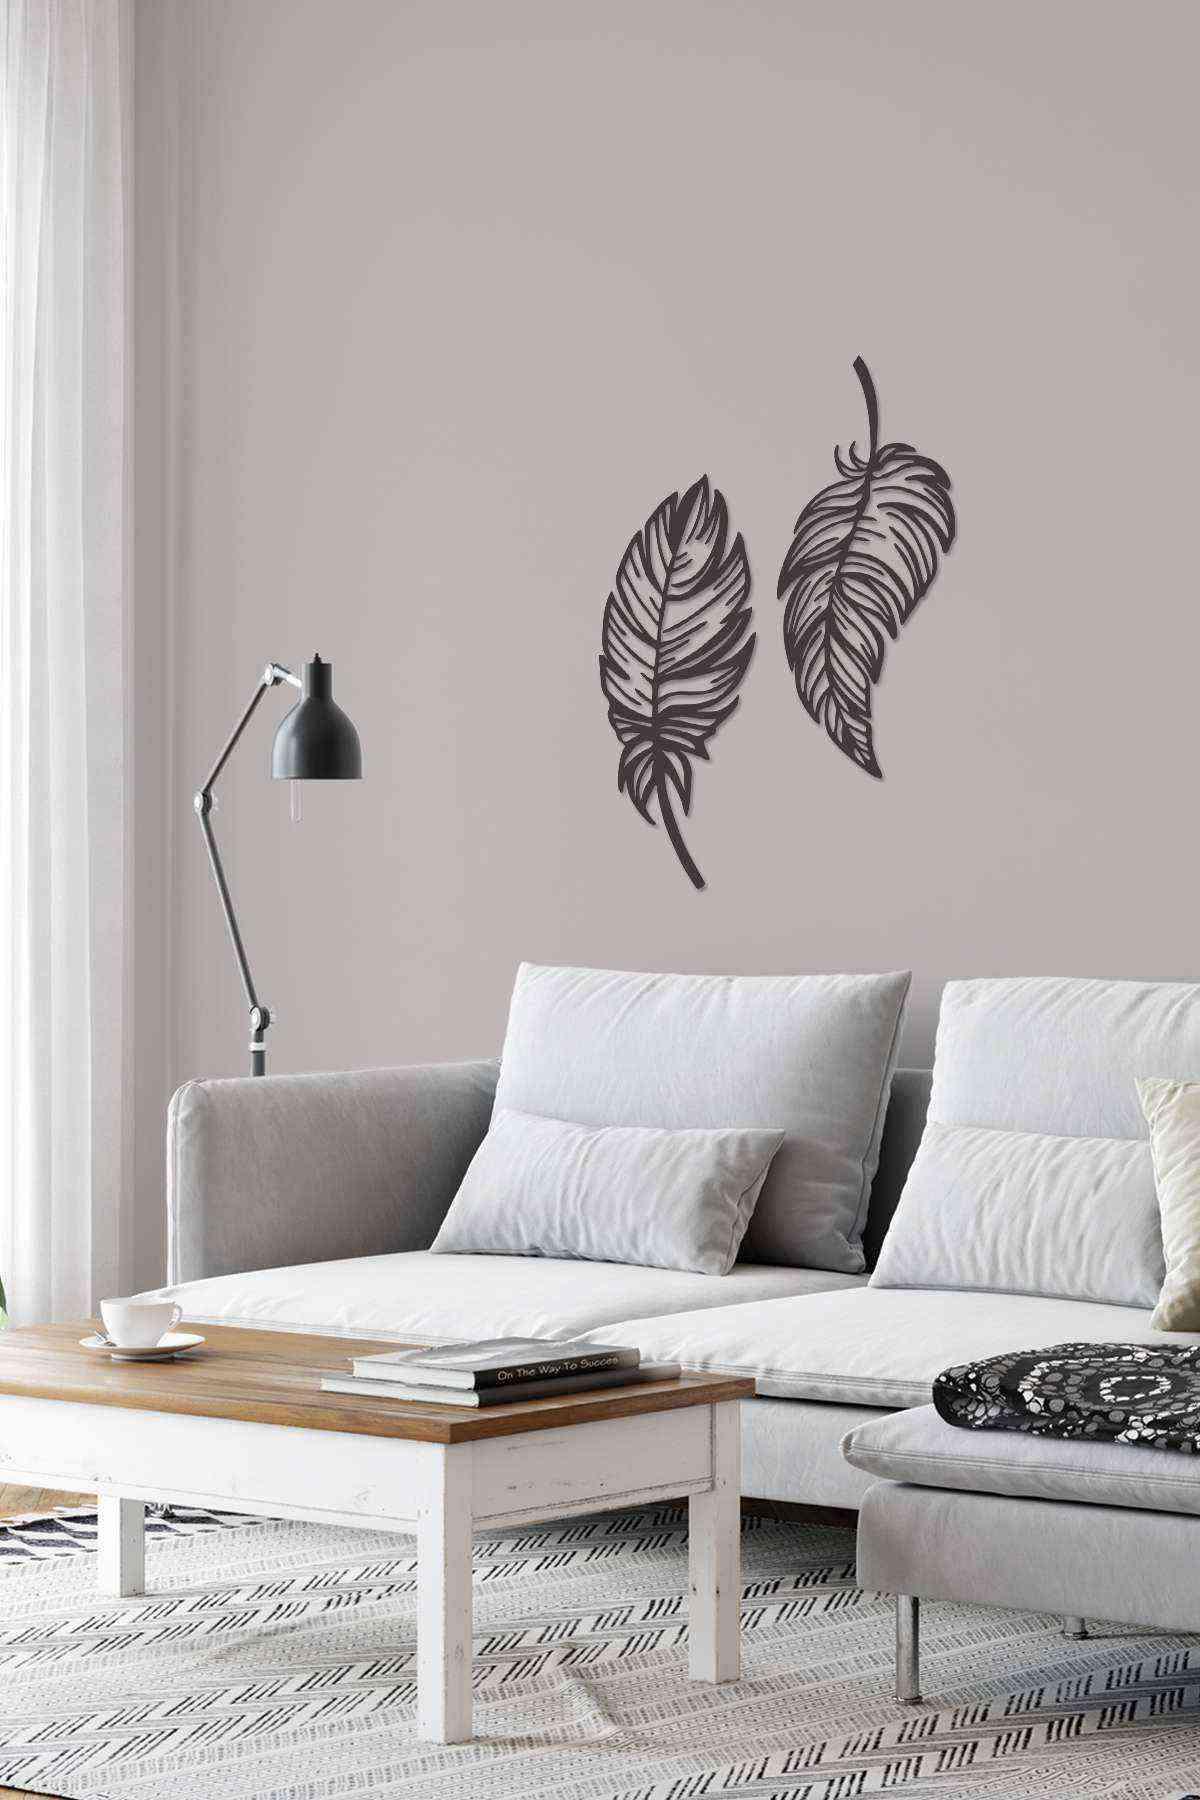 Yaprak Mdf Duvar Tablosu 50 cm